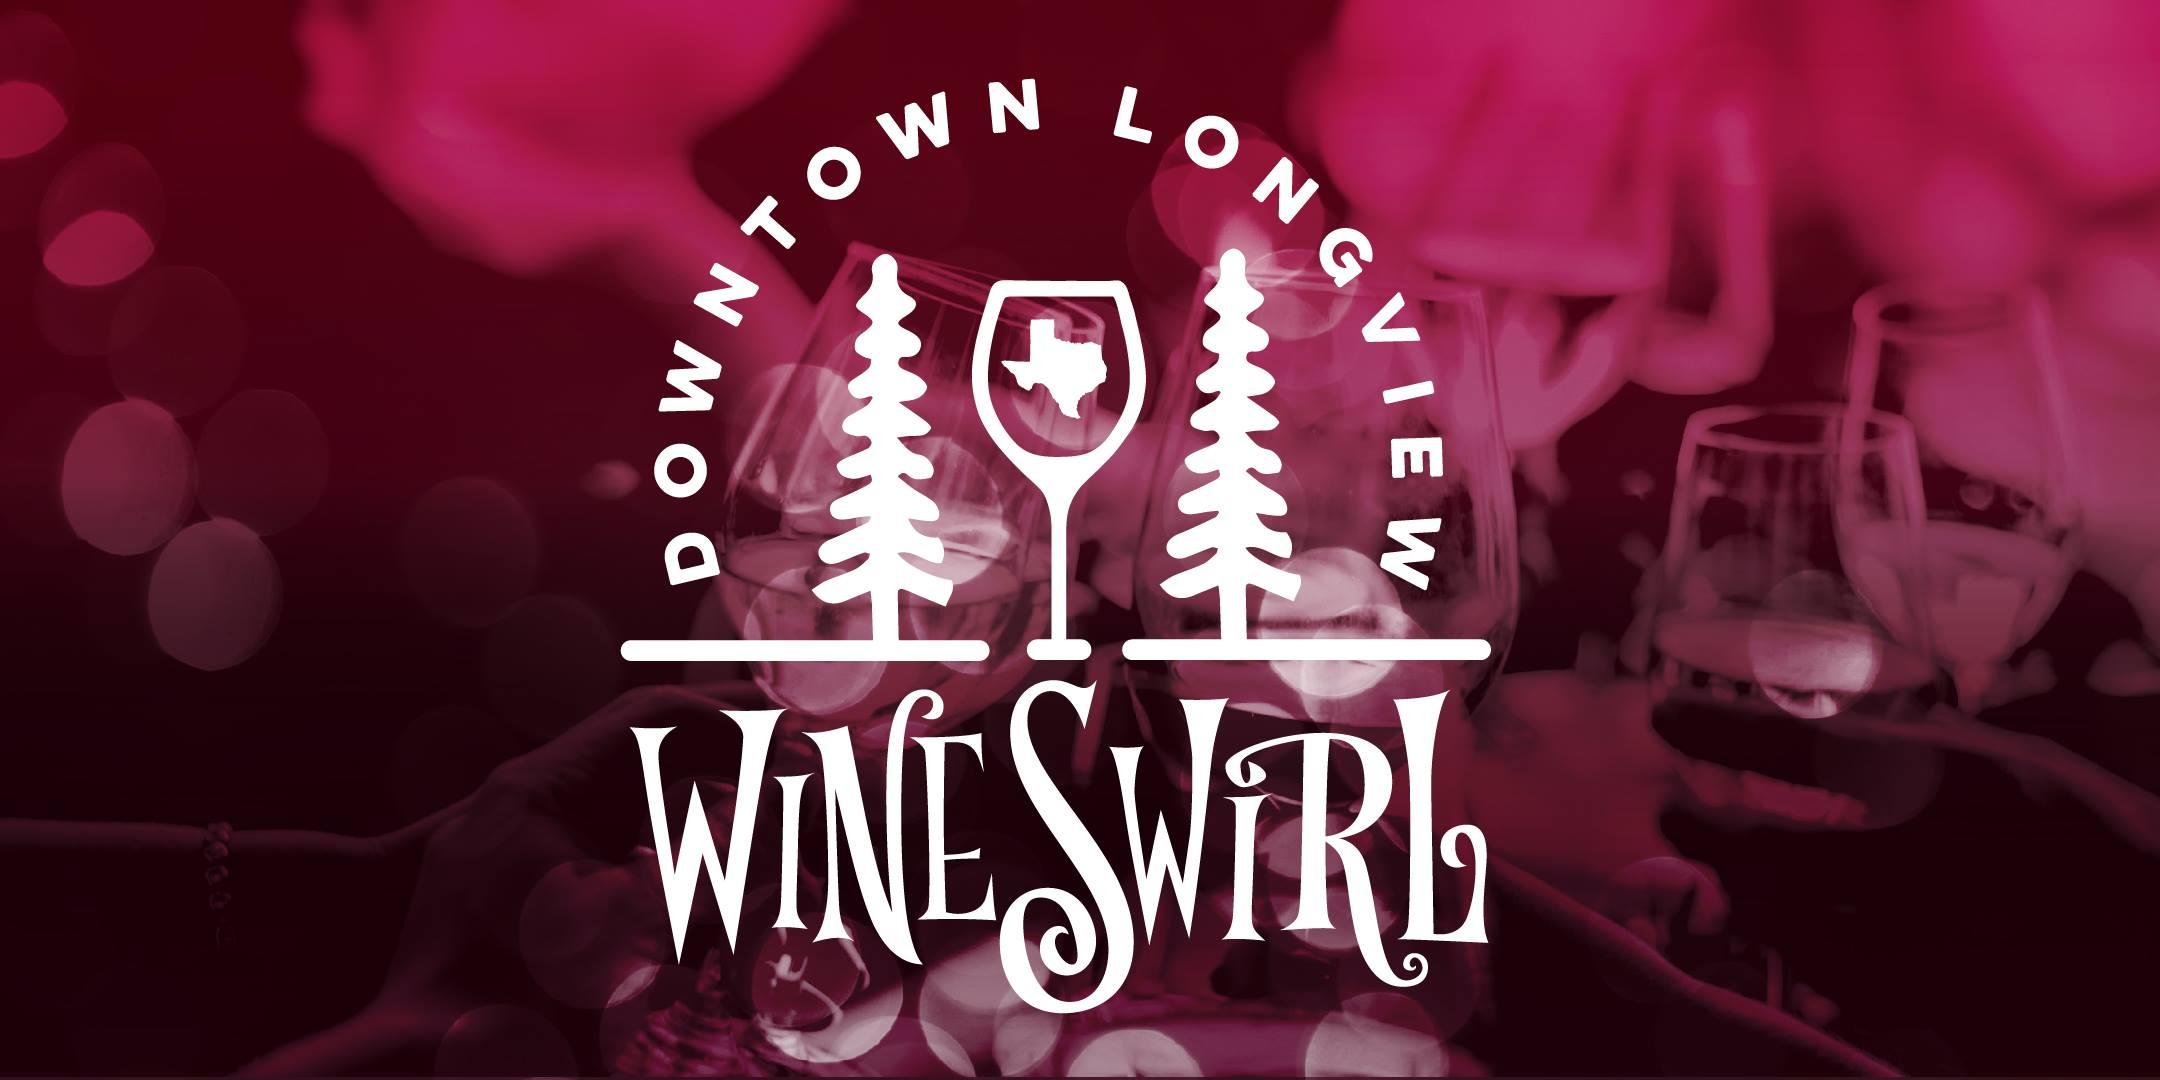 wineswirl.jpg